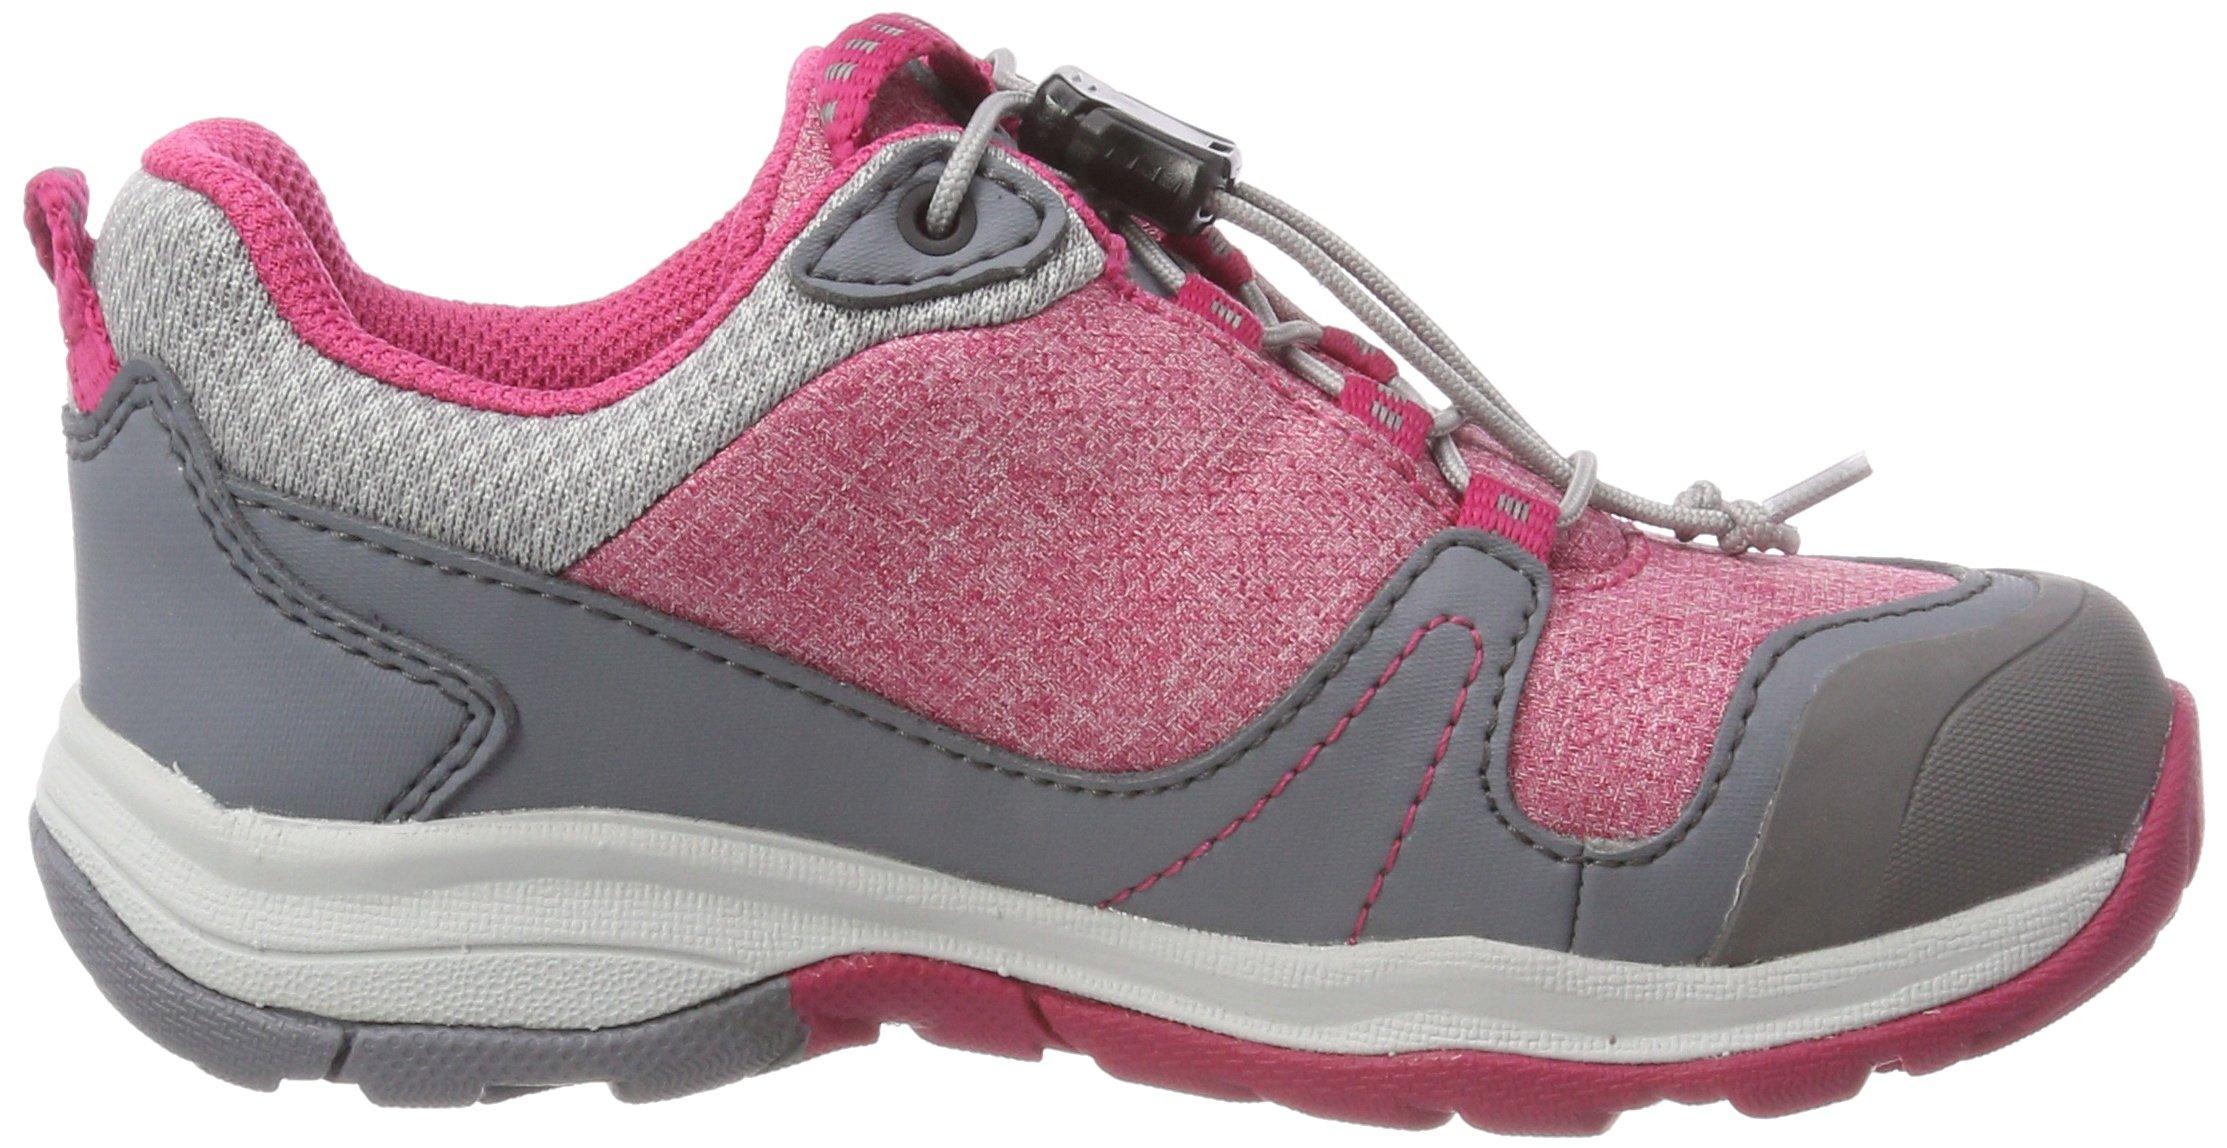 Jack Wolfskin Girls Grivla Texapore Low G Wasserdicht Rise Hiking Shoes 6